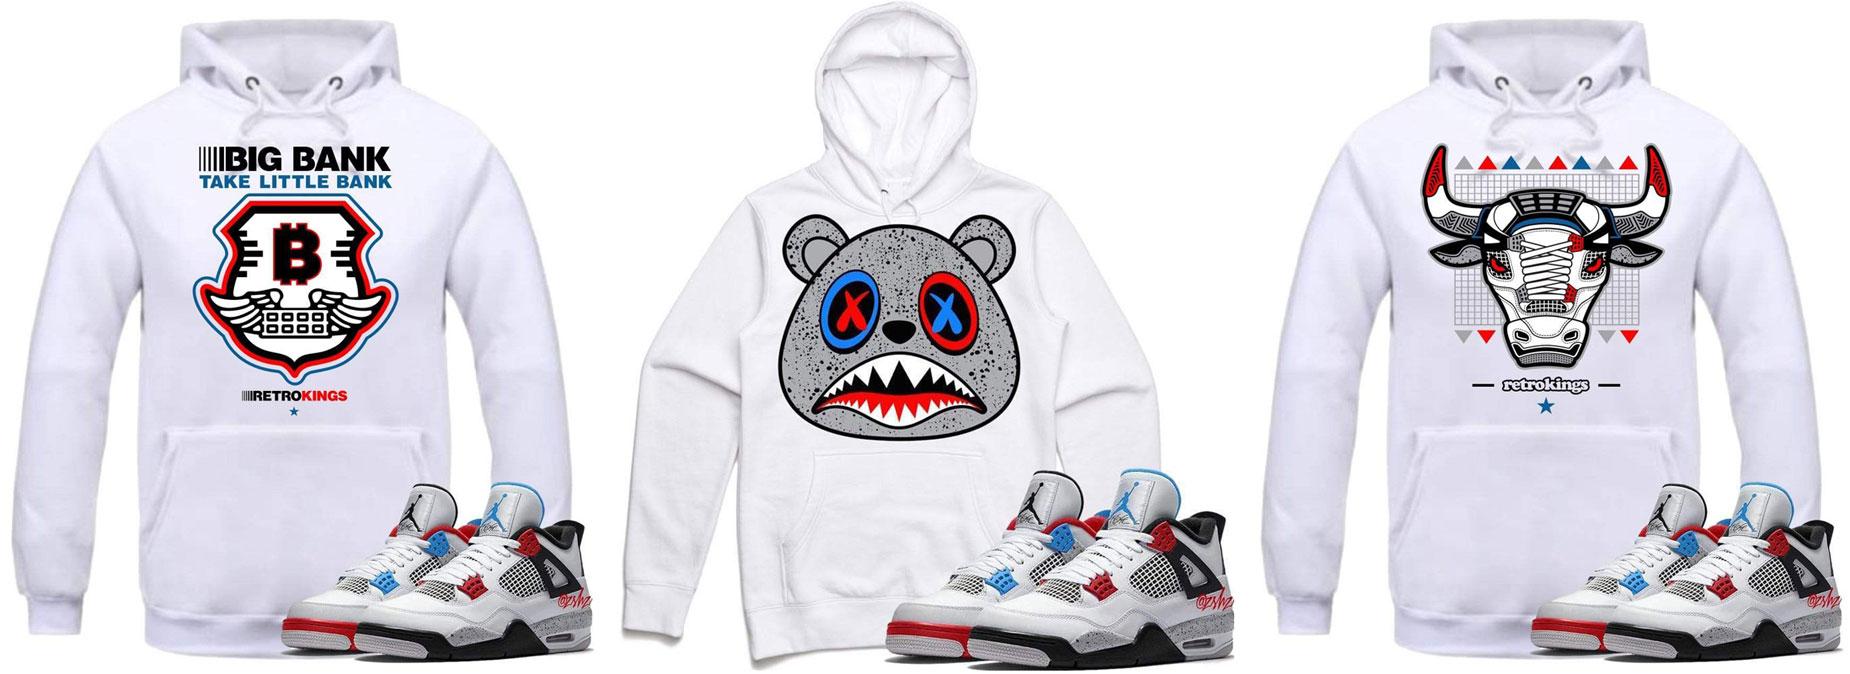 air-jordan-4-what-the-sneaker-match-hoodies